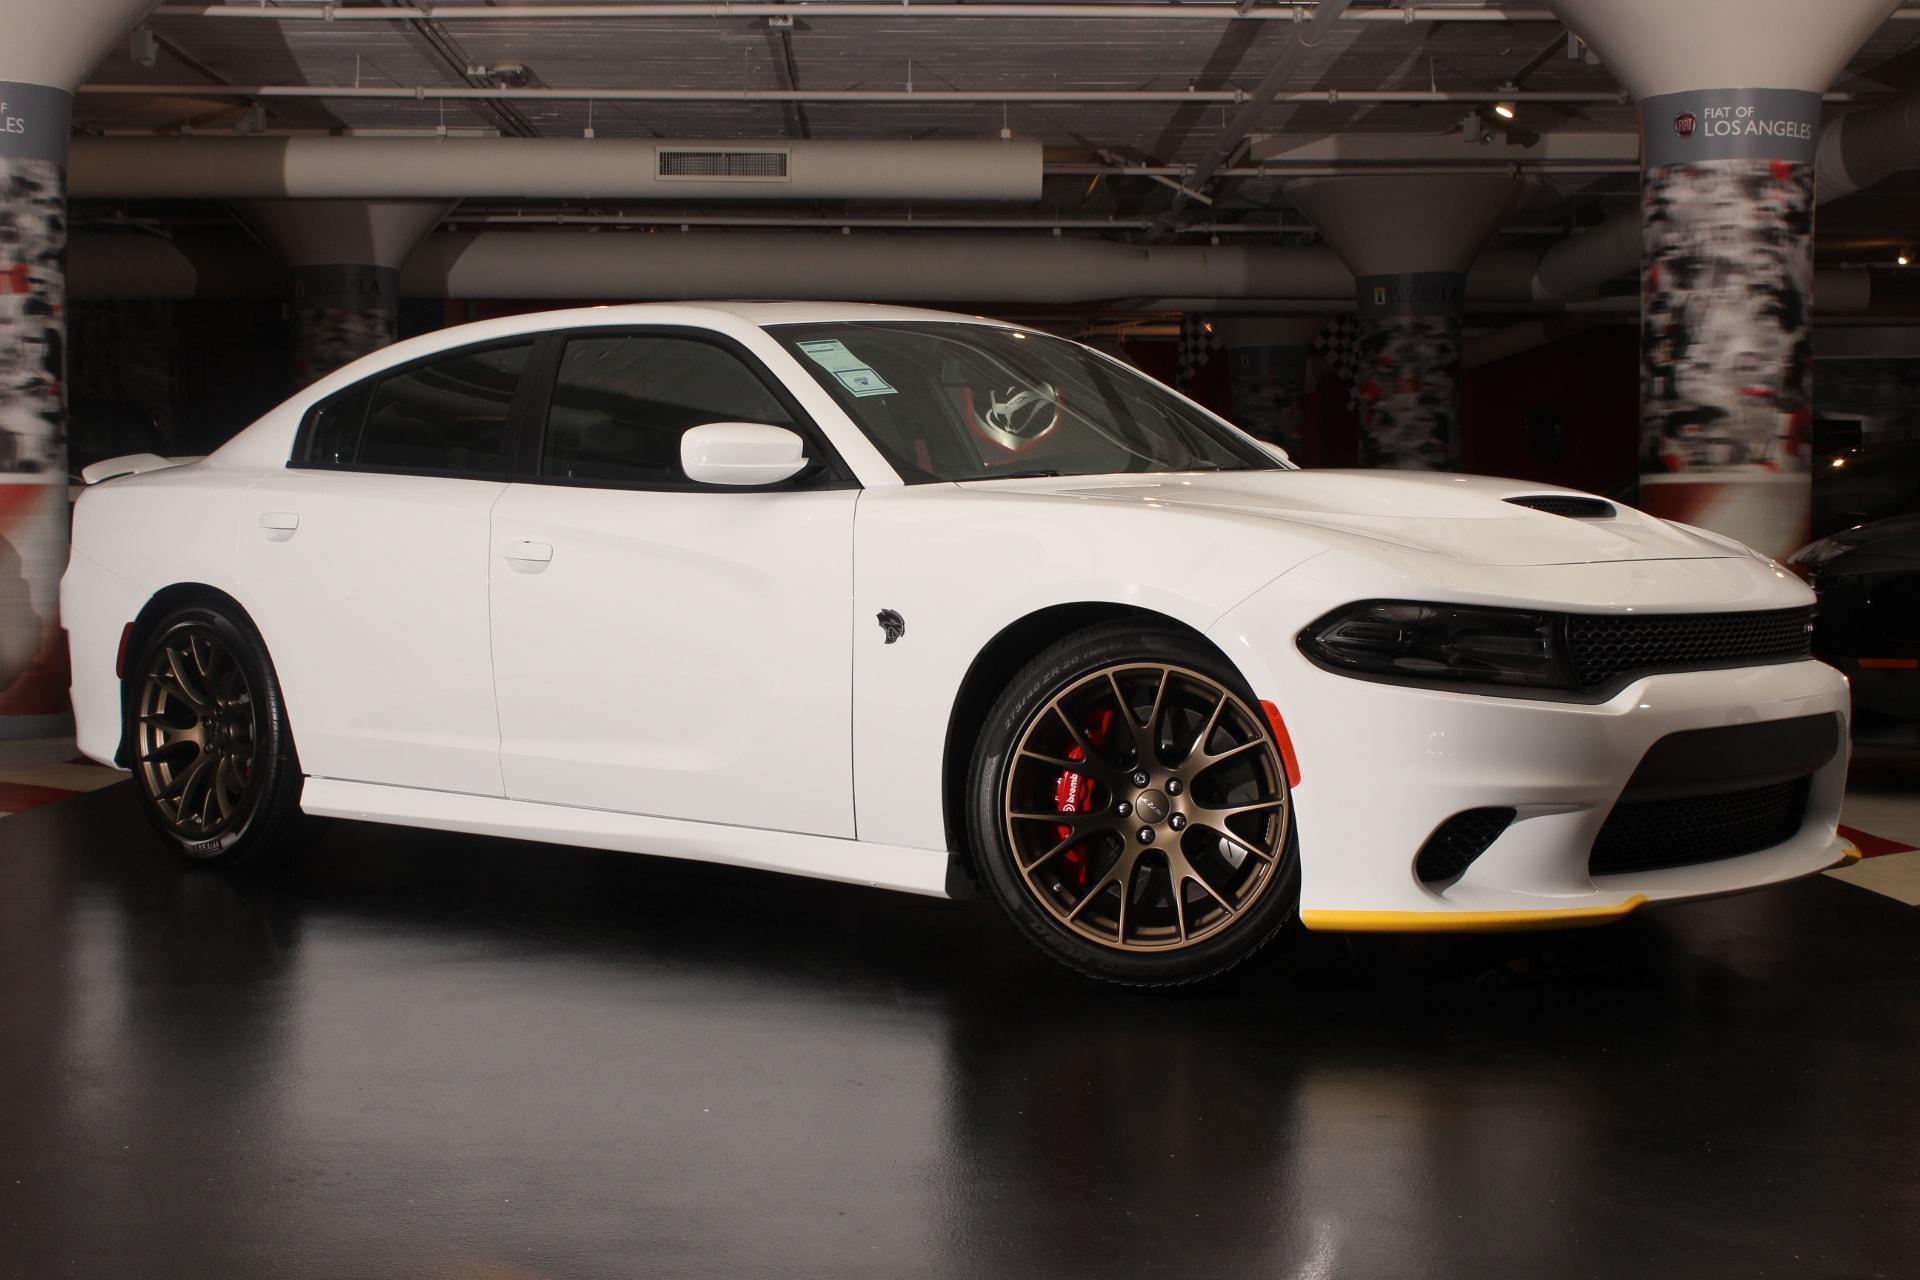 2017 Dodge Charger SRT Hellcat  19 harmankardon Greenedge Speakers 50 State Emissions Engine